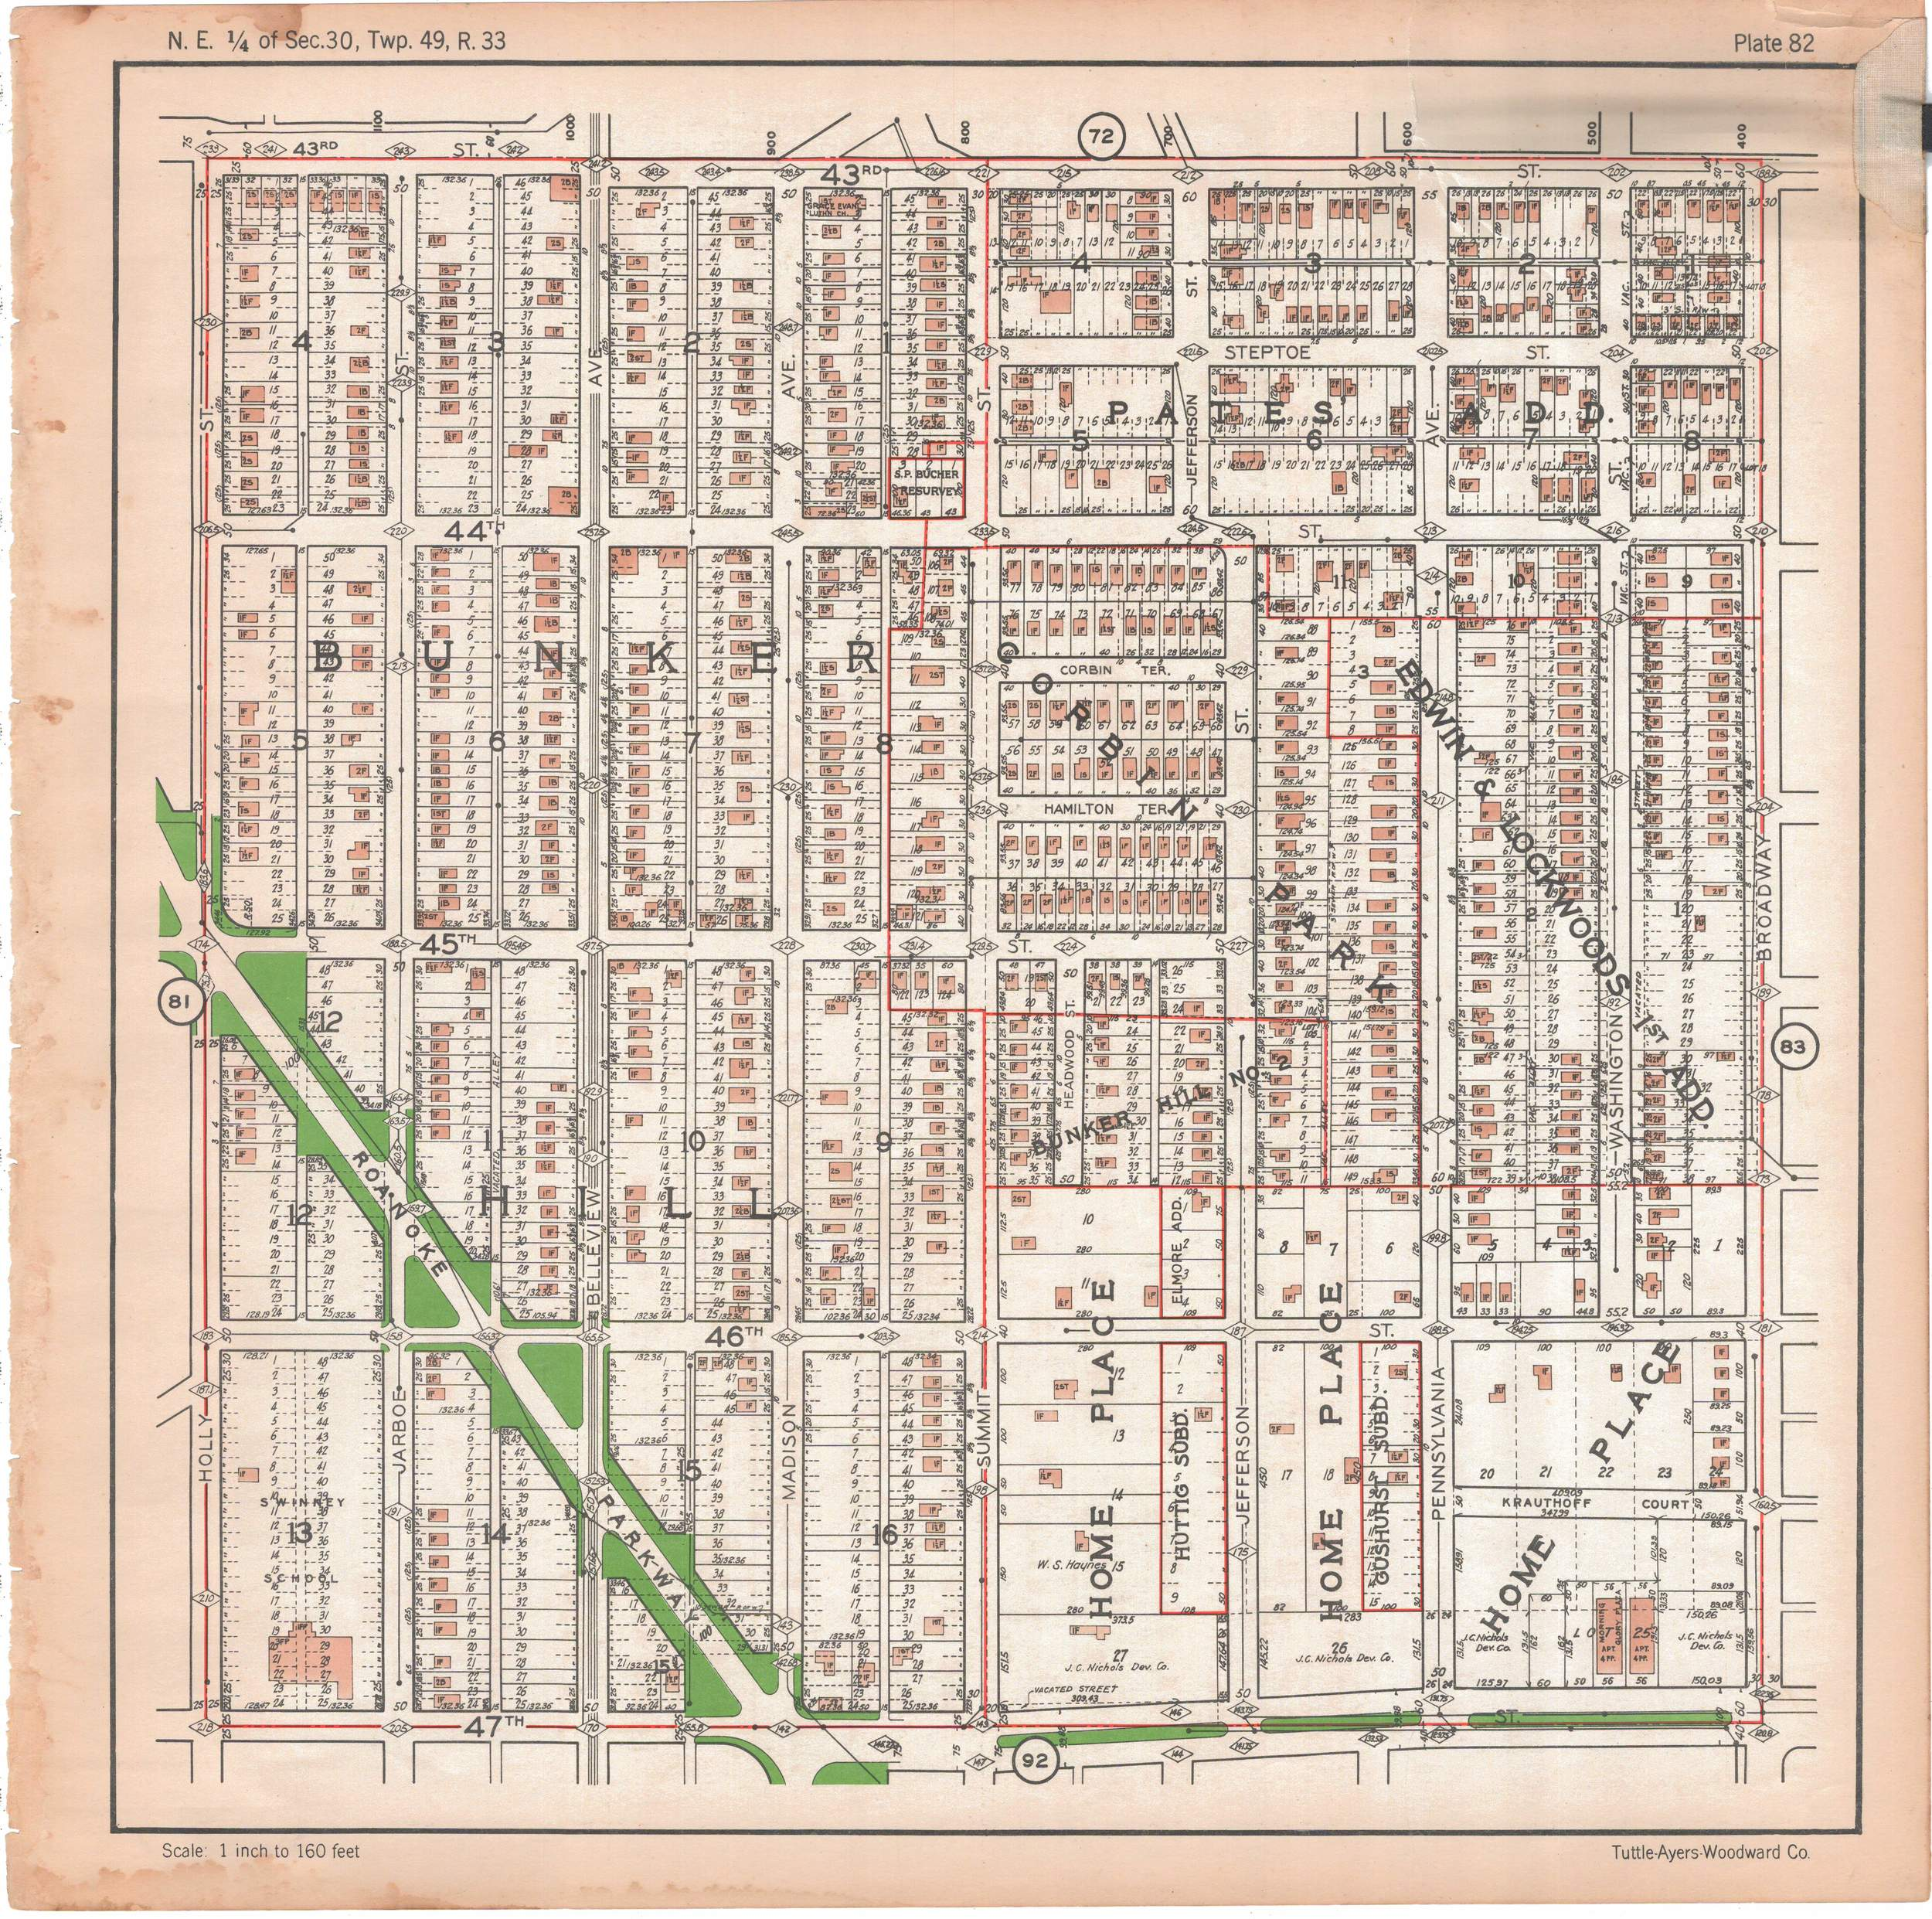 1925 TUTTLE_AYERS_Plate 82.JPG